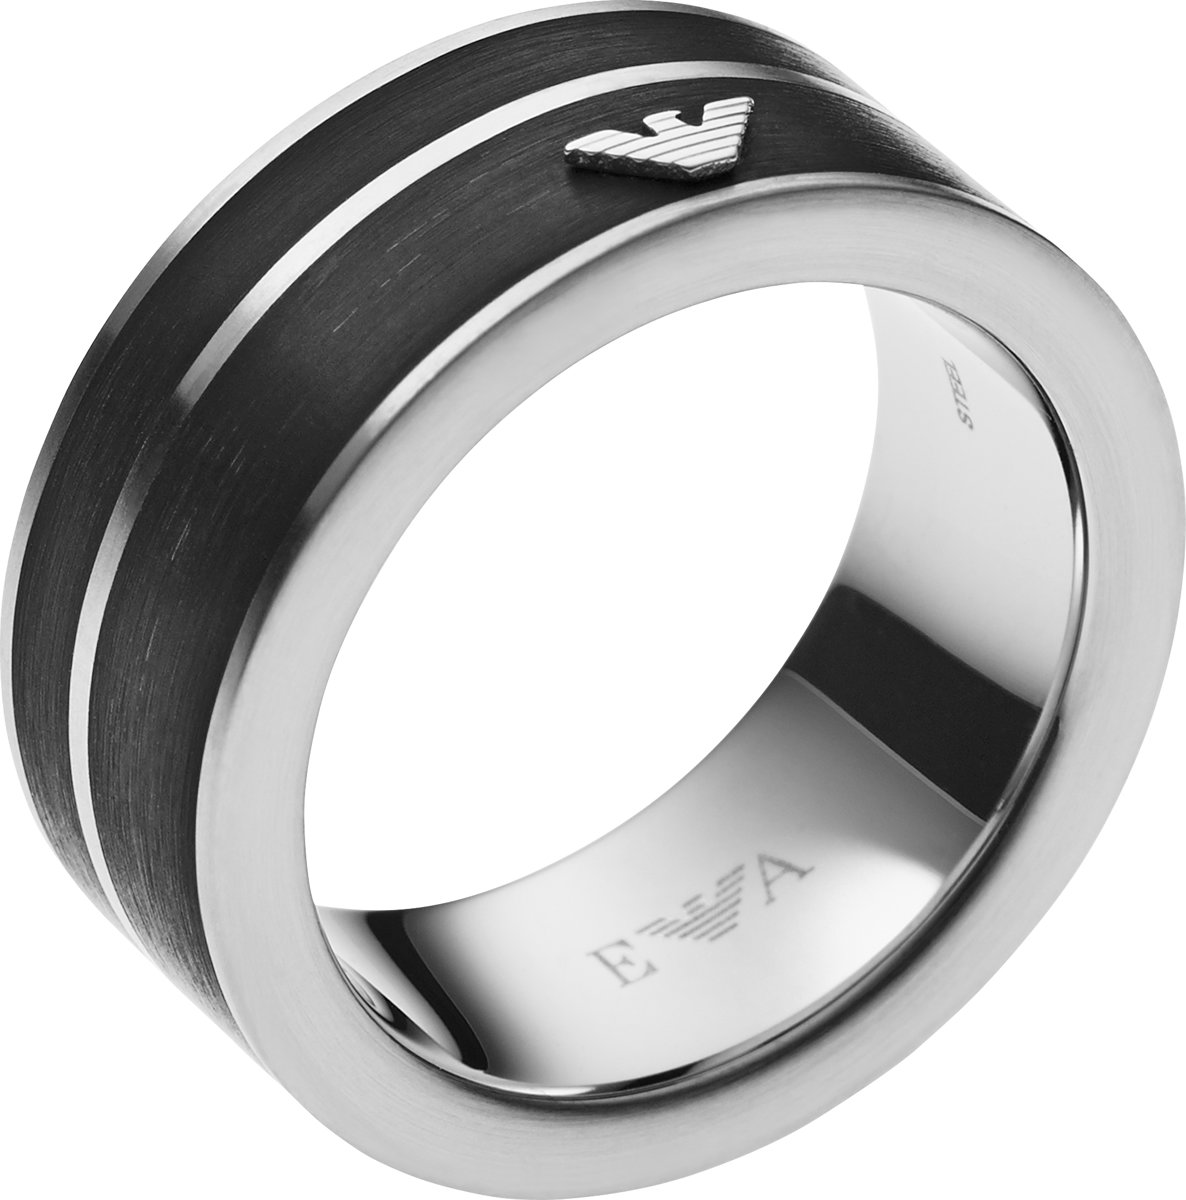 Emporio Armani Mannen Ring EGS2032040 kopen